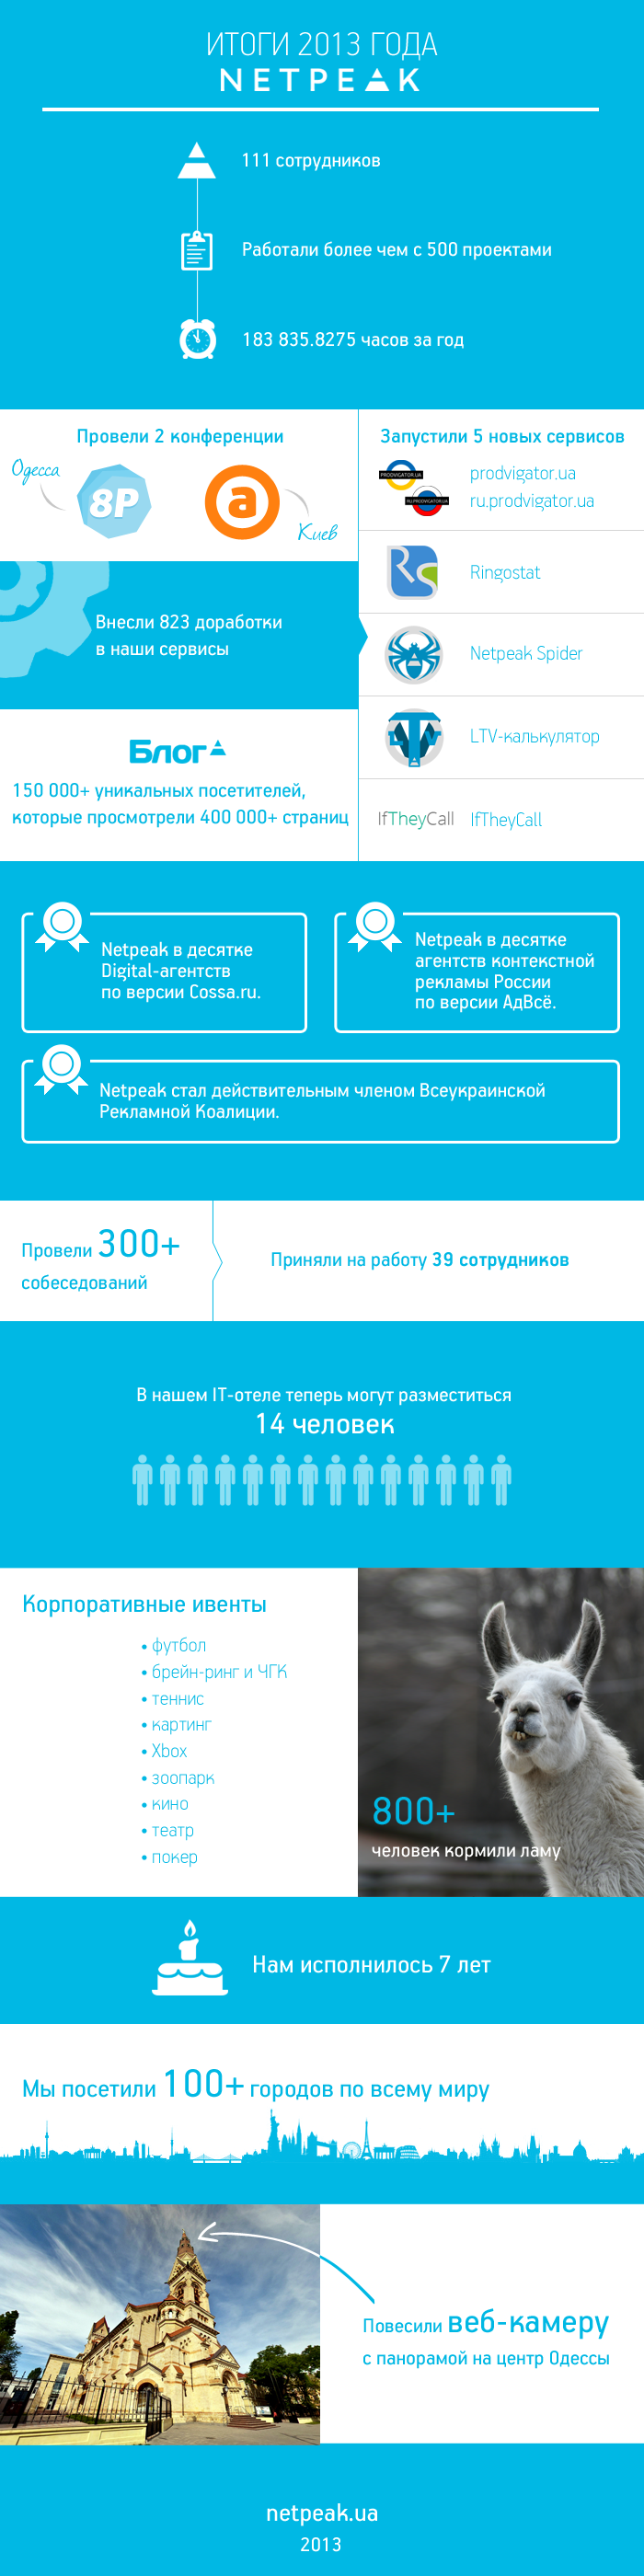 Итоги 2013 года Netpeak